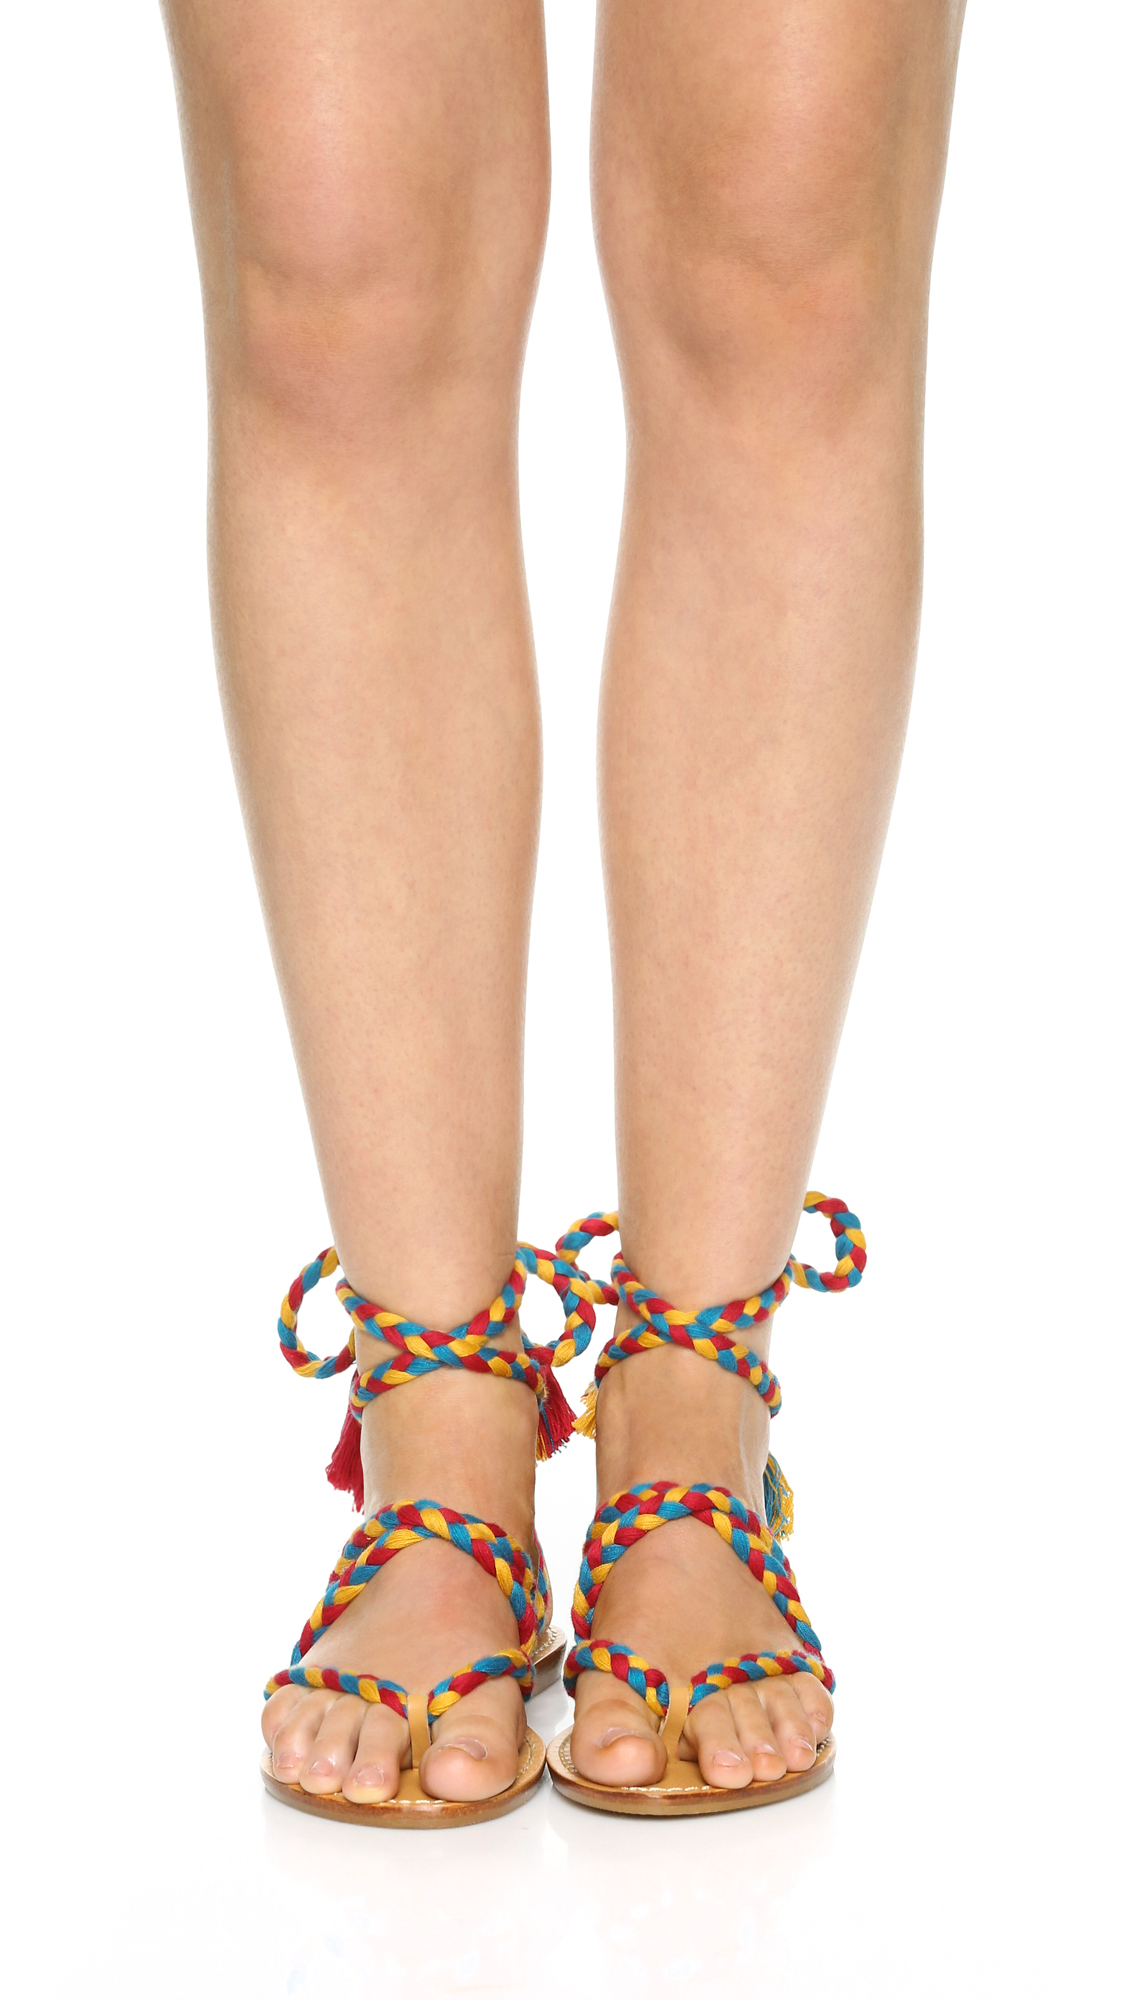 c09edbc681bd Soludos Gladiator Lace Up Sandals